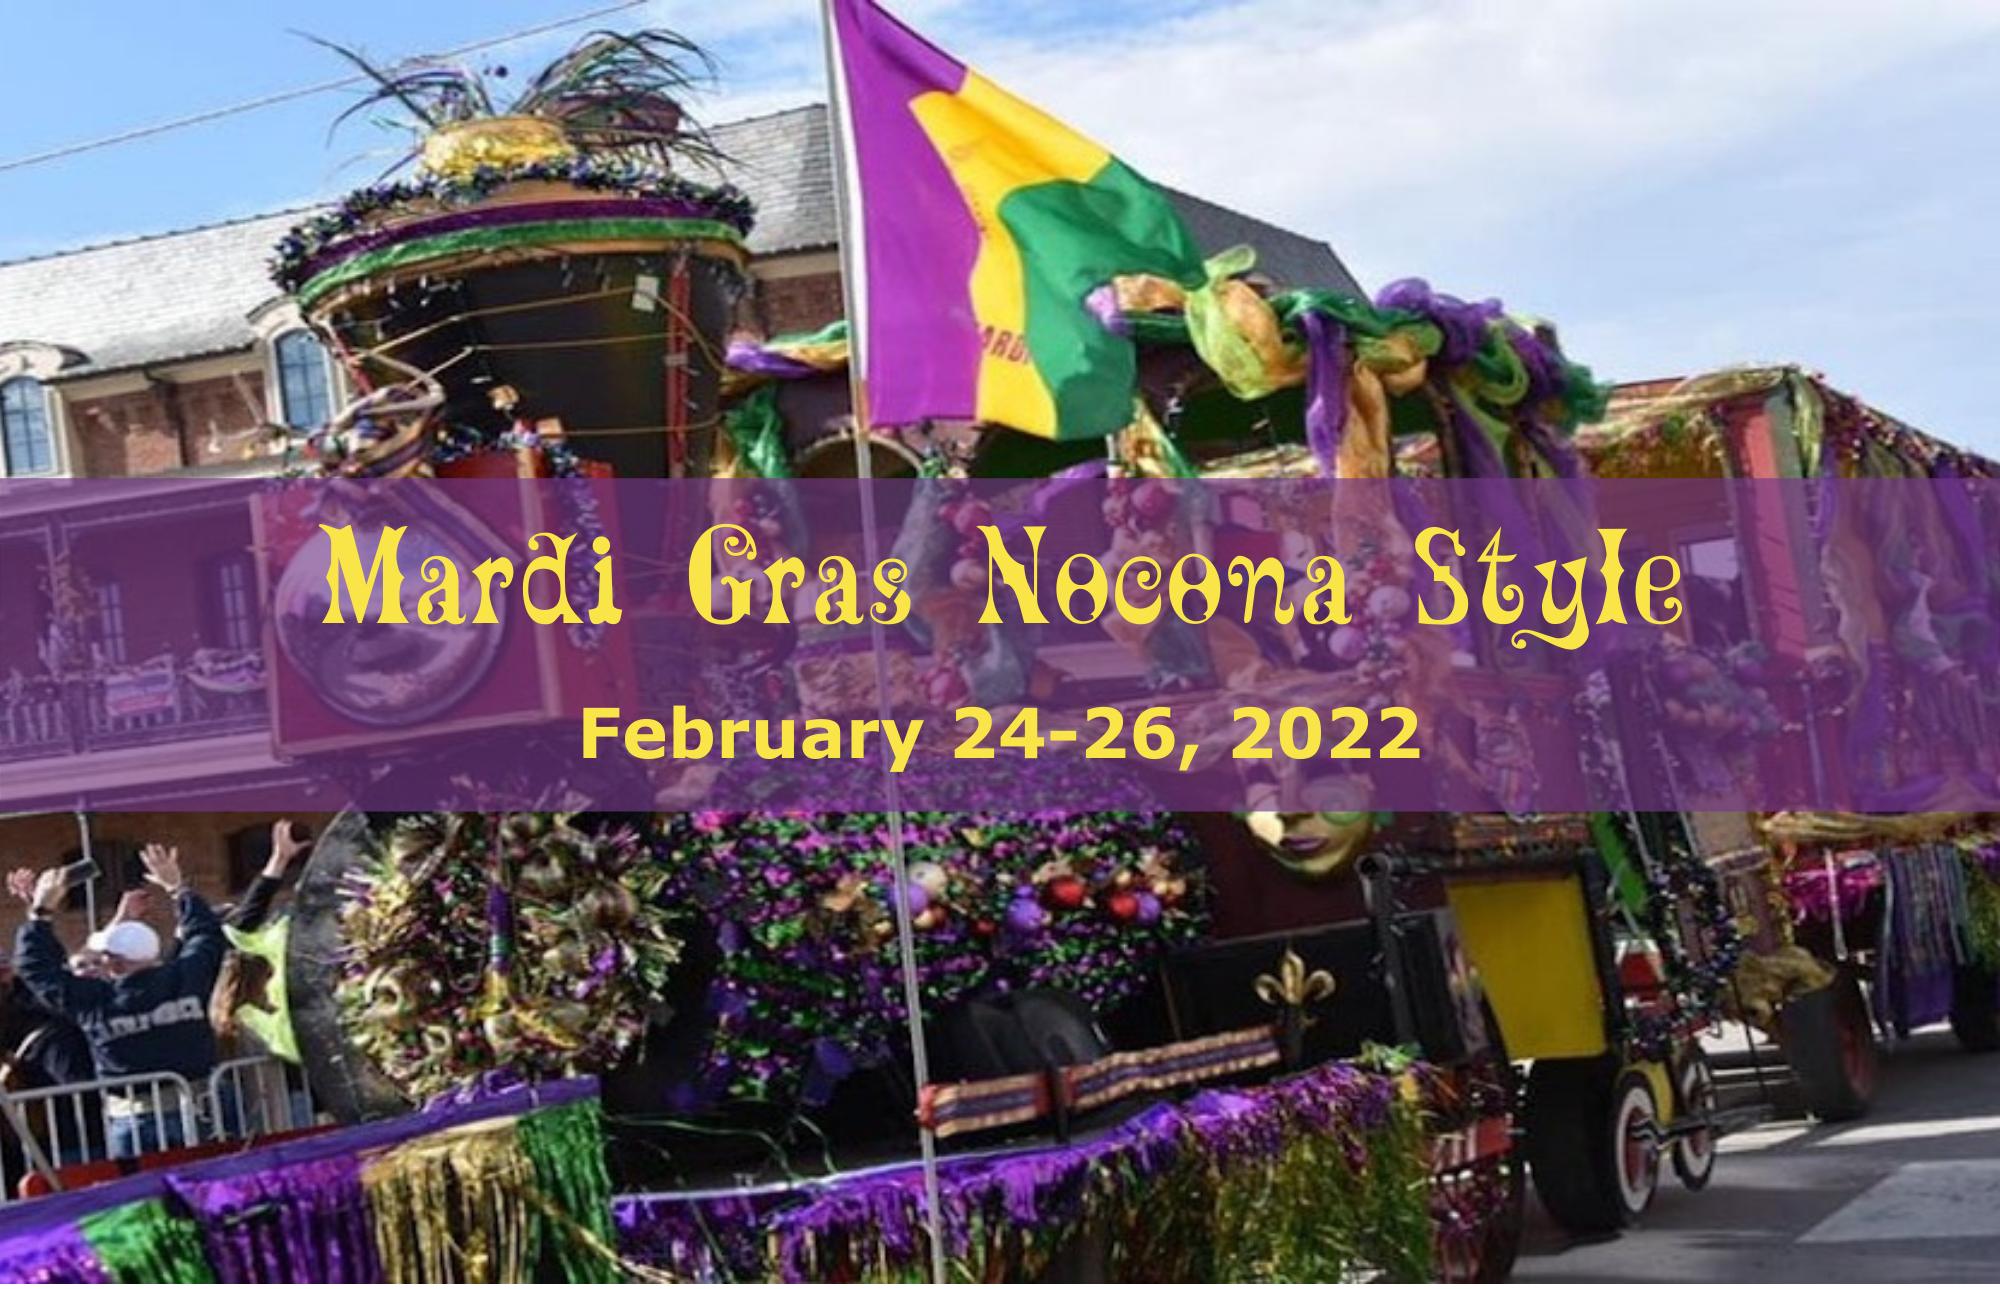 Mardi Gras Nocona Style 2022